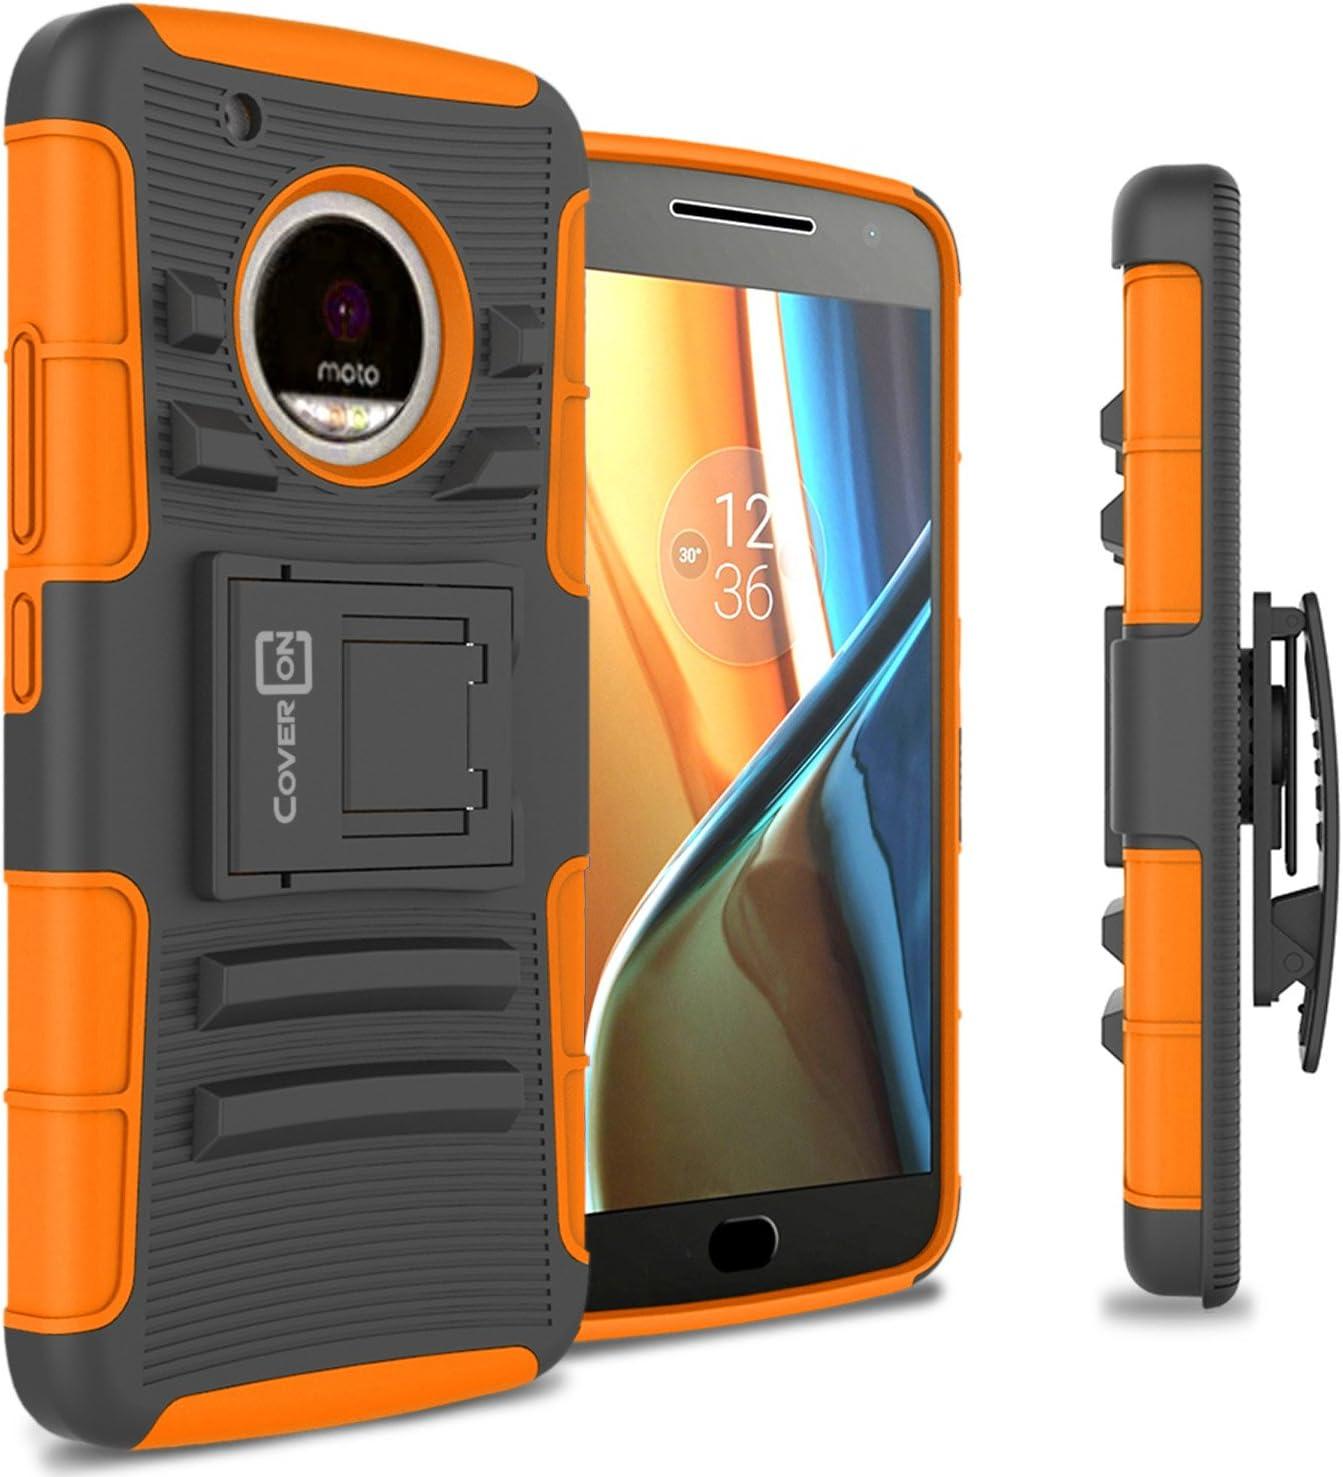 CoverON Kickstand Belt Clip Explorer Series for Motorola Moto G5 Plus/Moto X 2017 Holster Case, Orange on Black